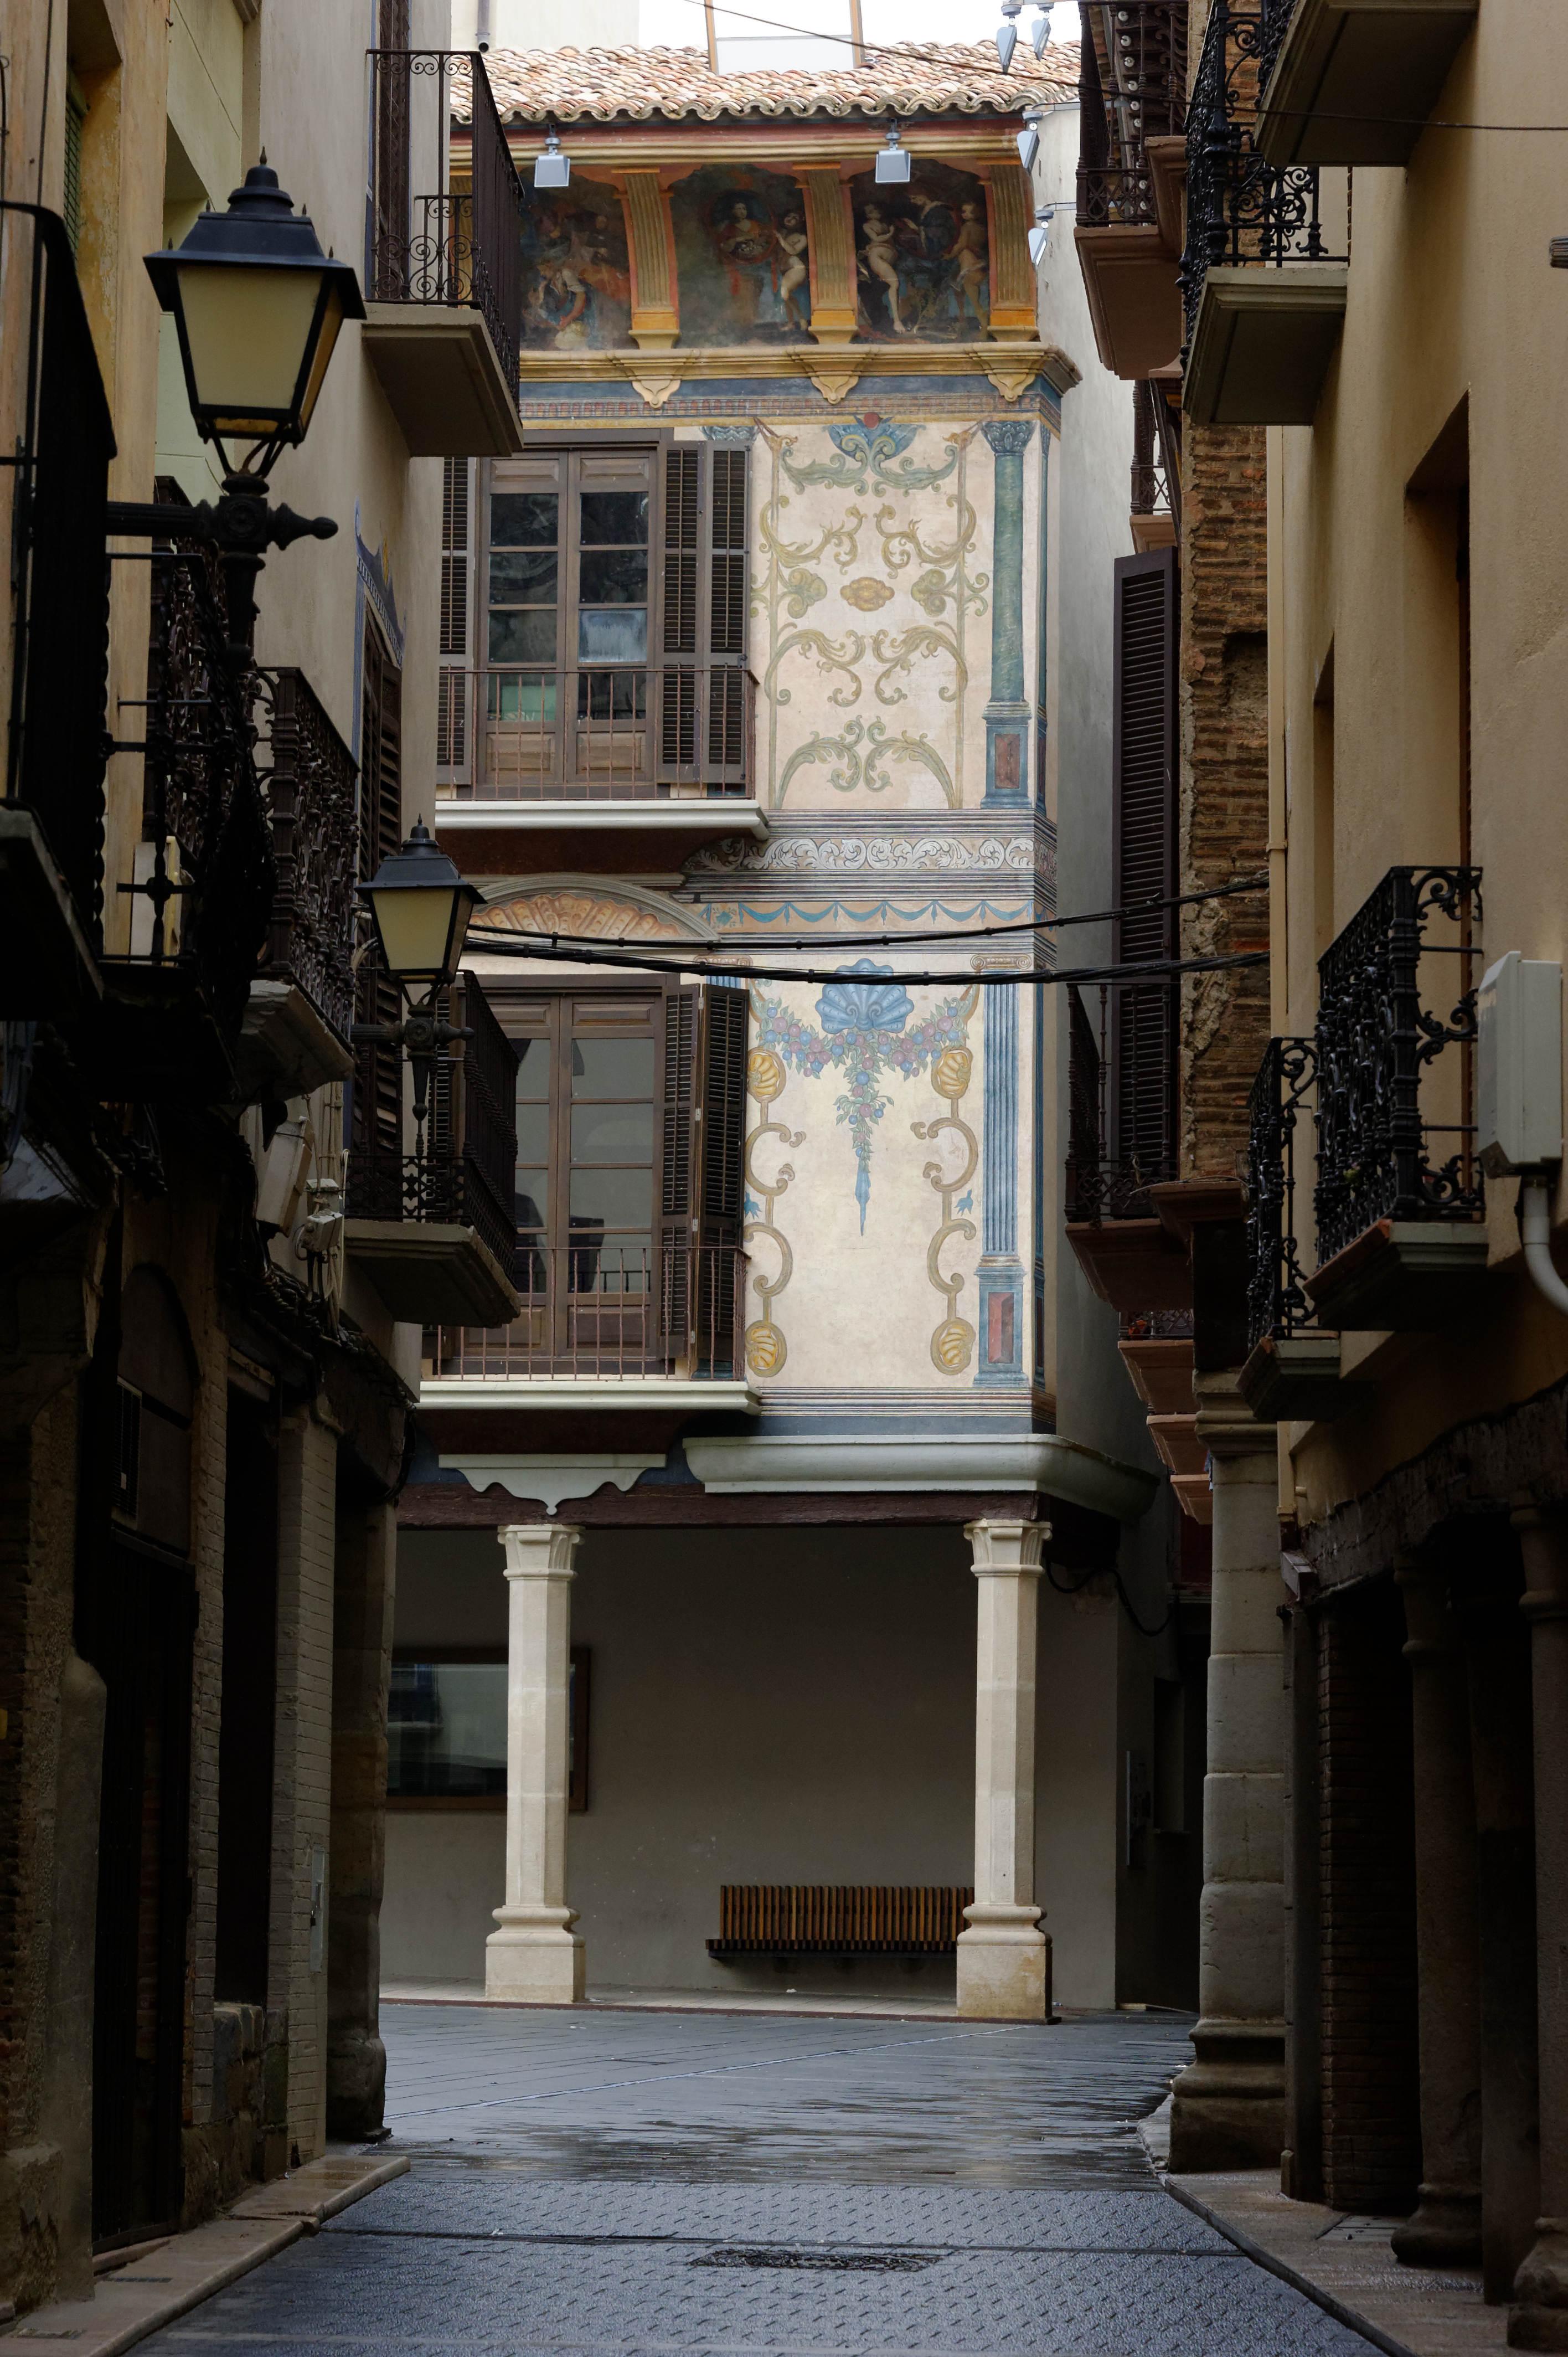 4344_Graus (Aragon)